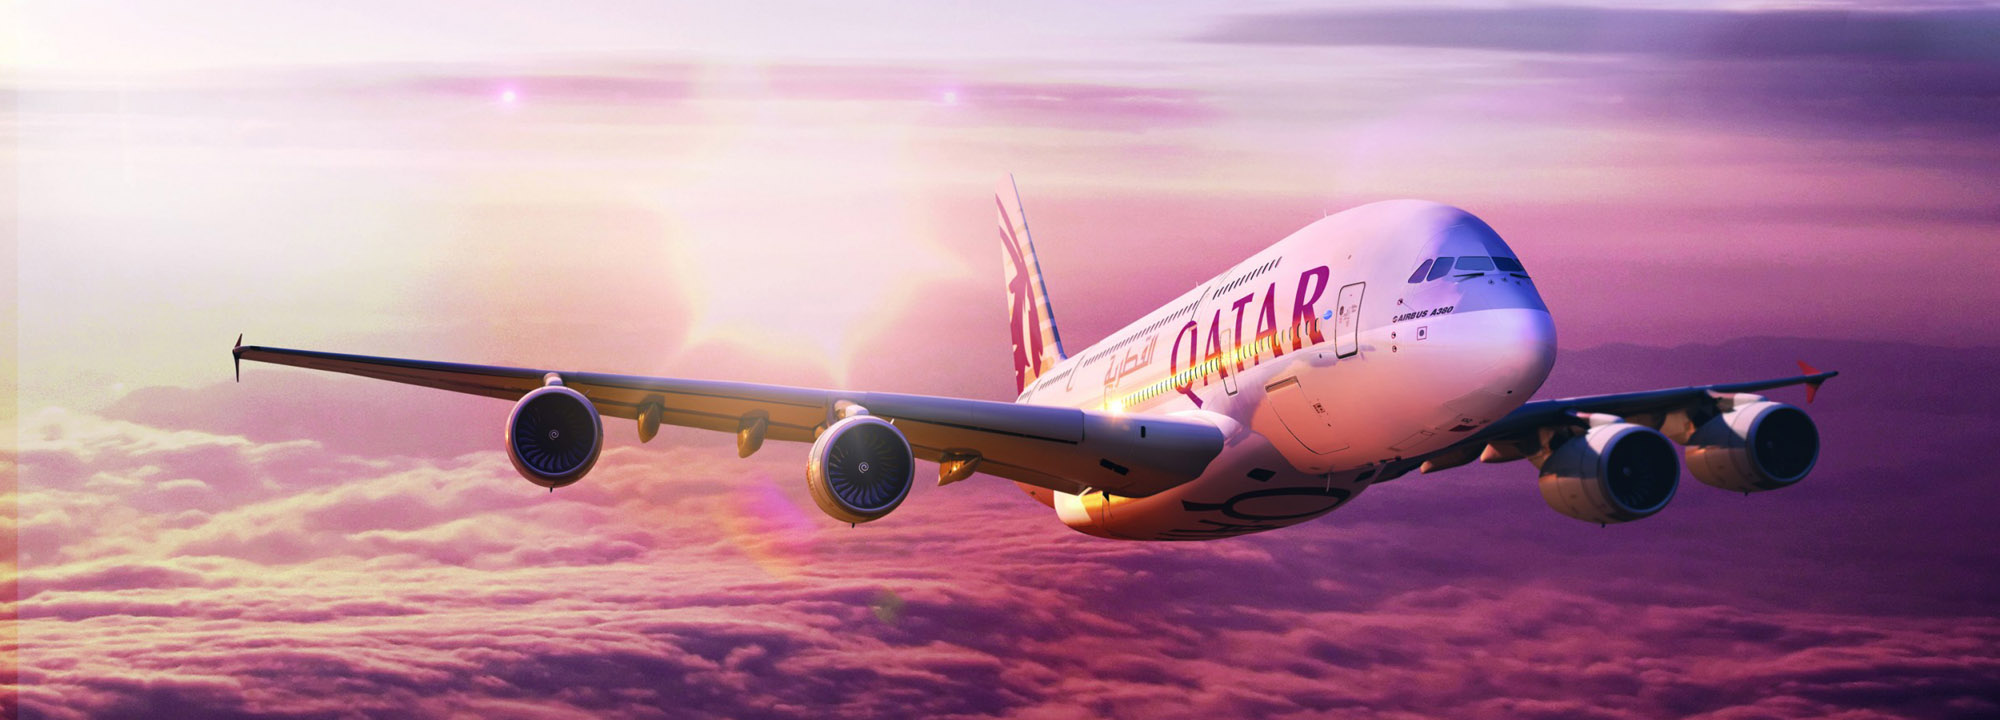 Letadlo společnosti Qatar Airways